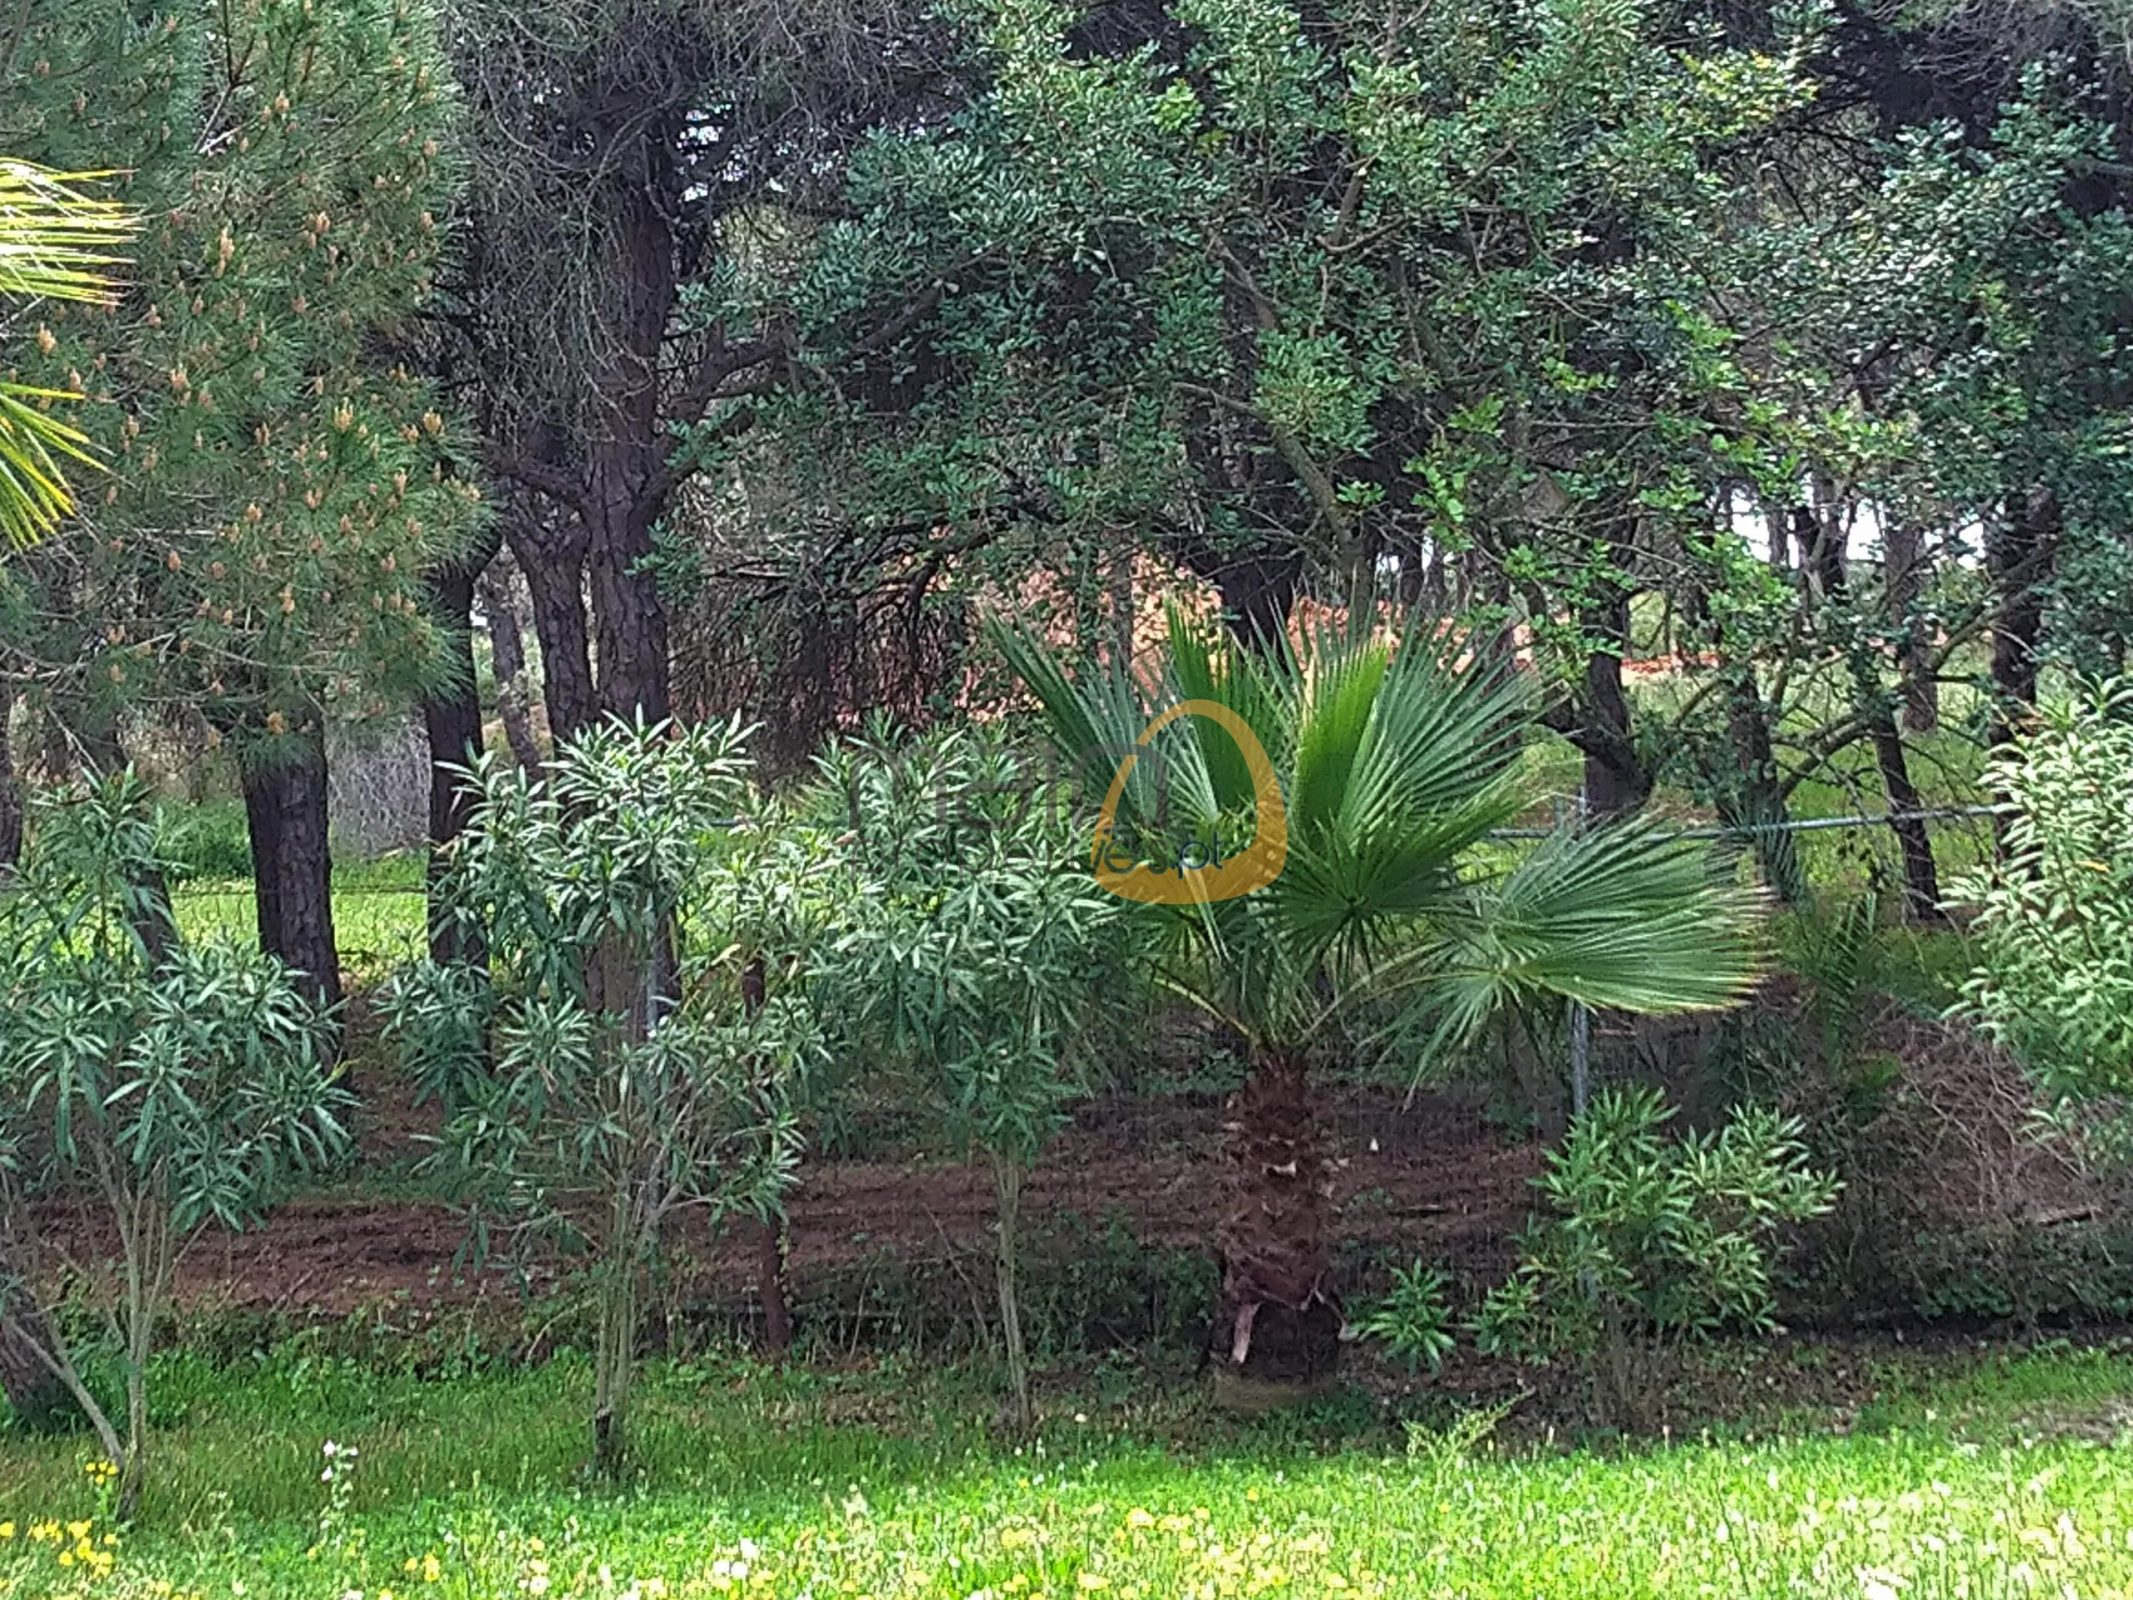 [:pt]Terreno para construção de moradia em Montenegro - Faro : Algarve : Portugal : Terreno 7 :: MR039[:en]Land for Villa construction in Montenegro -  Faro : Algarve : Portugal :: Land 7 :: MainProperties :: MR039[:]